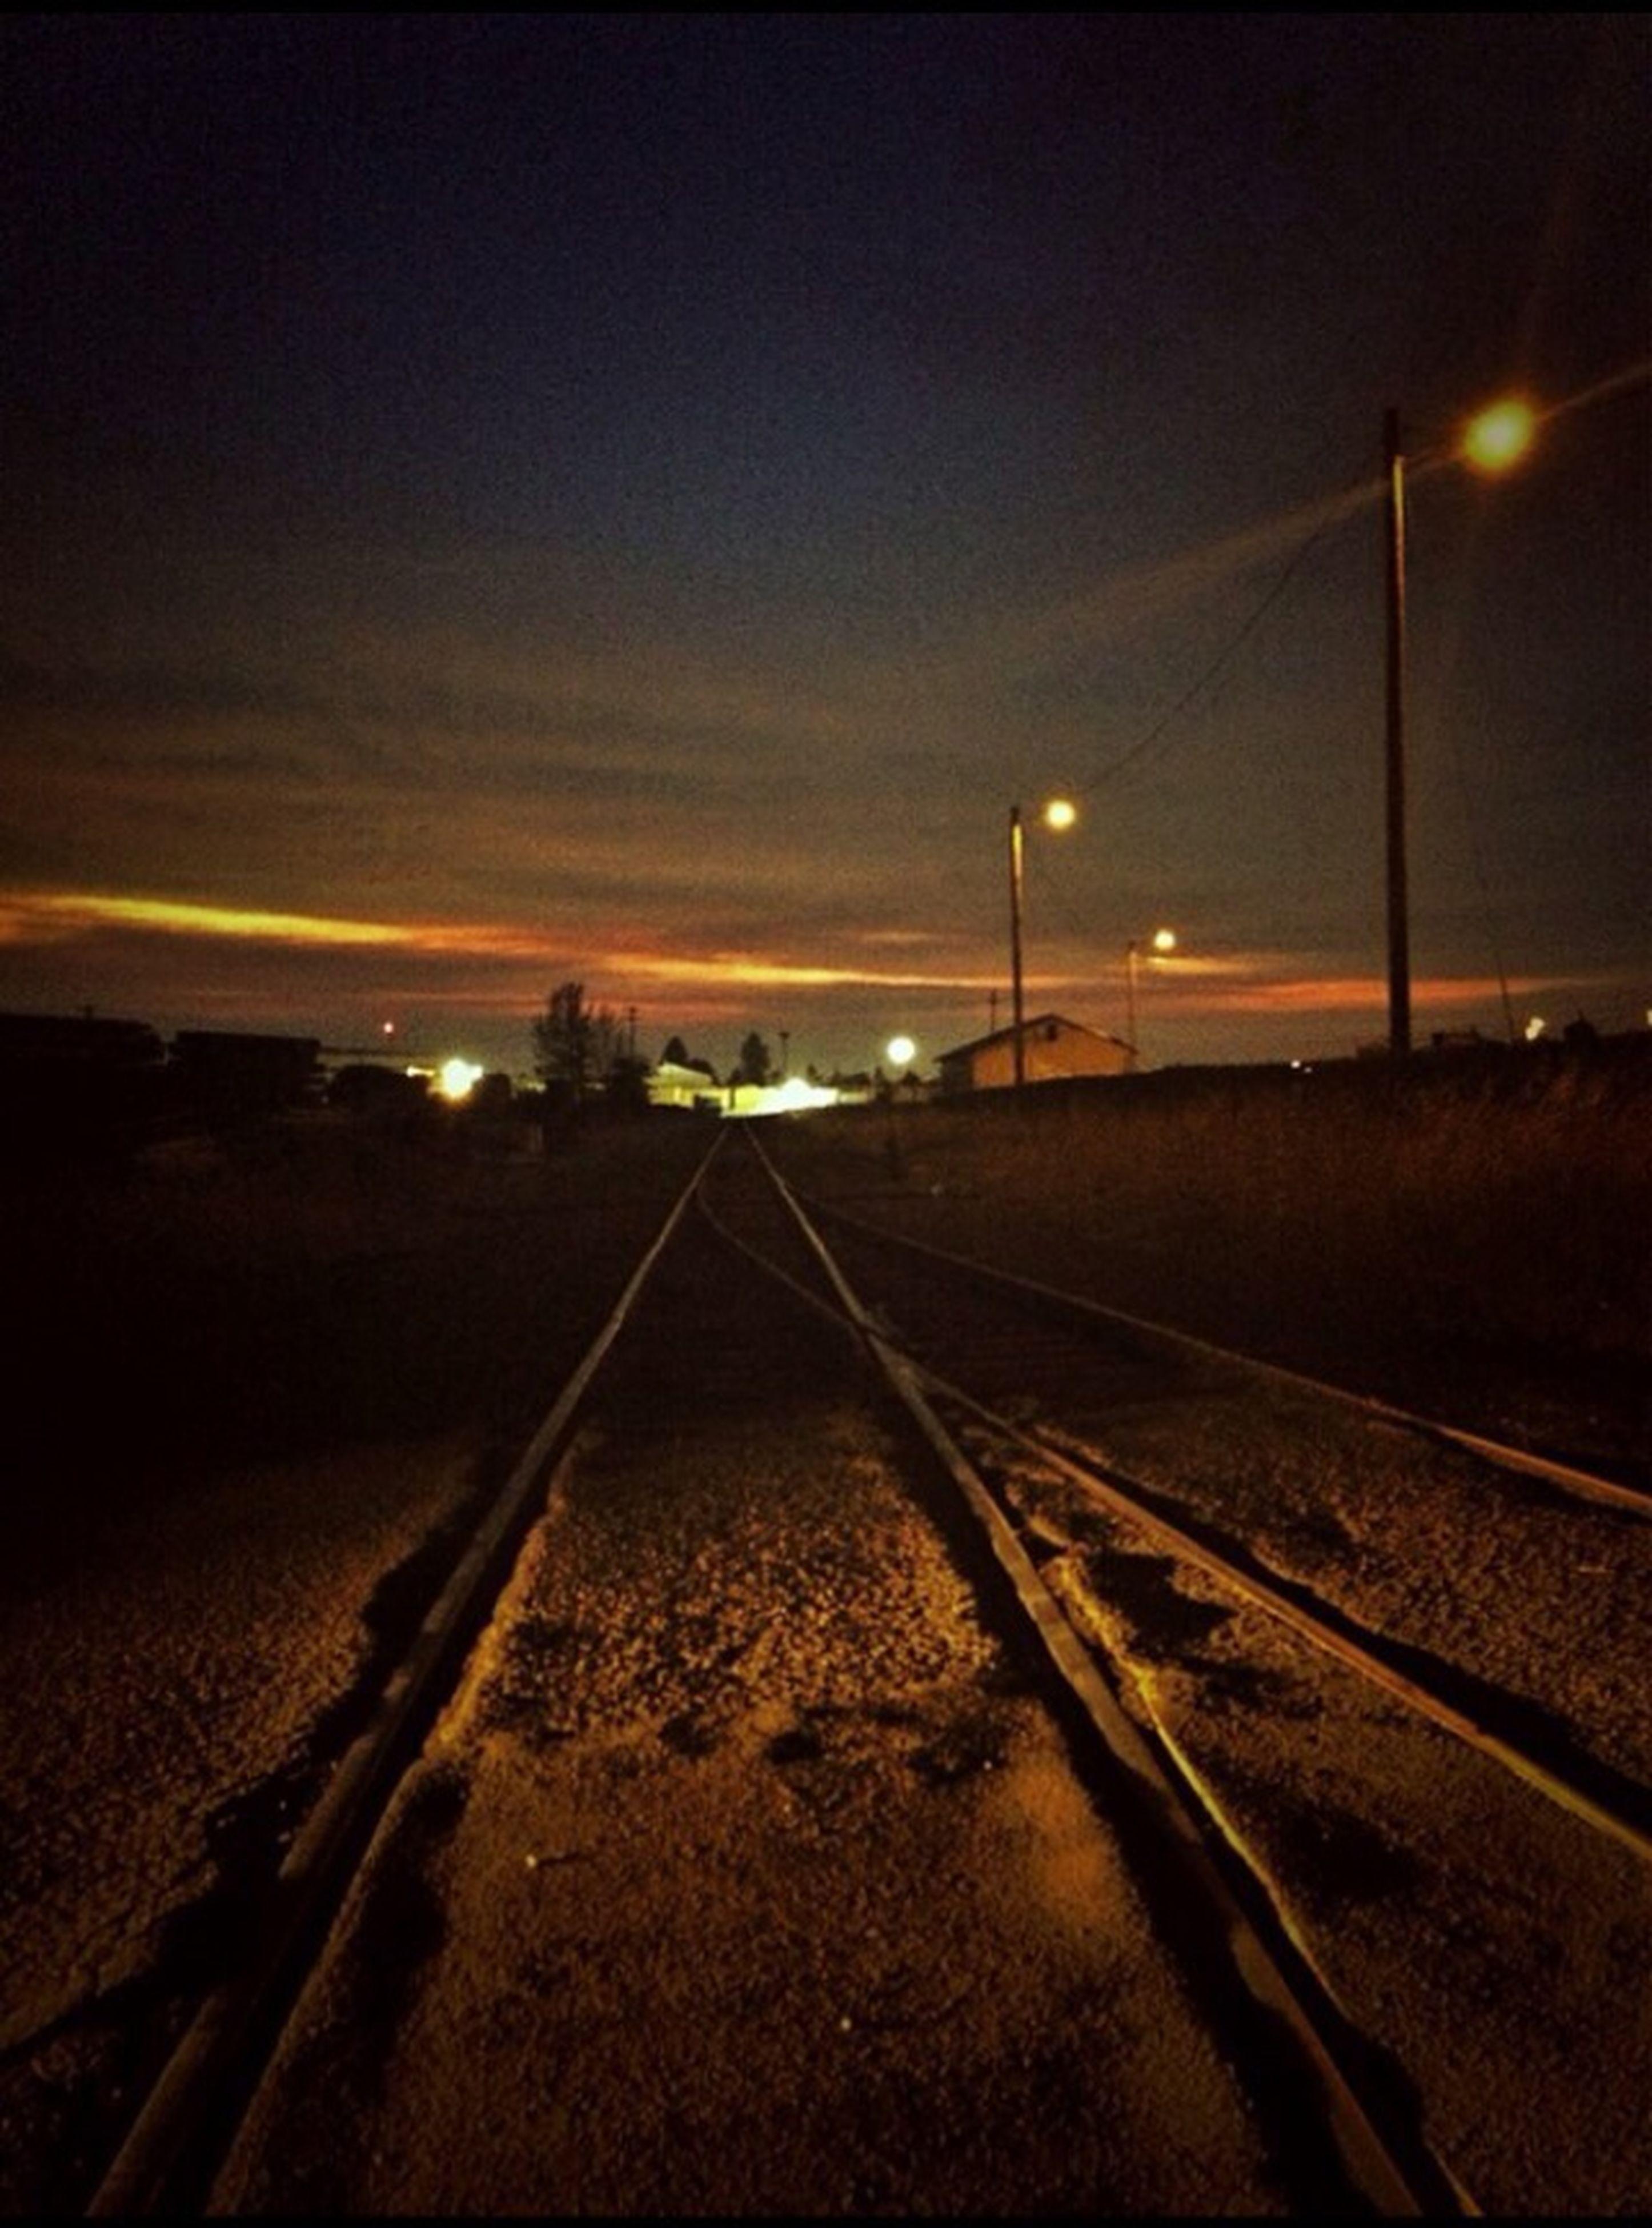 transportation, the way forward, railroad track, diminishing perspective, vanishing point, illuminated, sky, rail transportation, road, night, sunset, road marking, street light, dusk, long, surface level, straight, empty, outdoors, no people